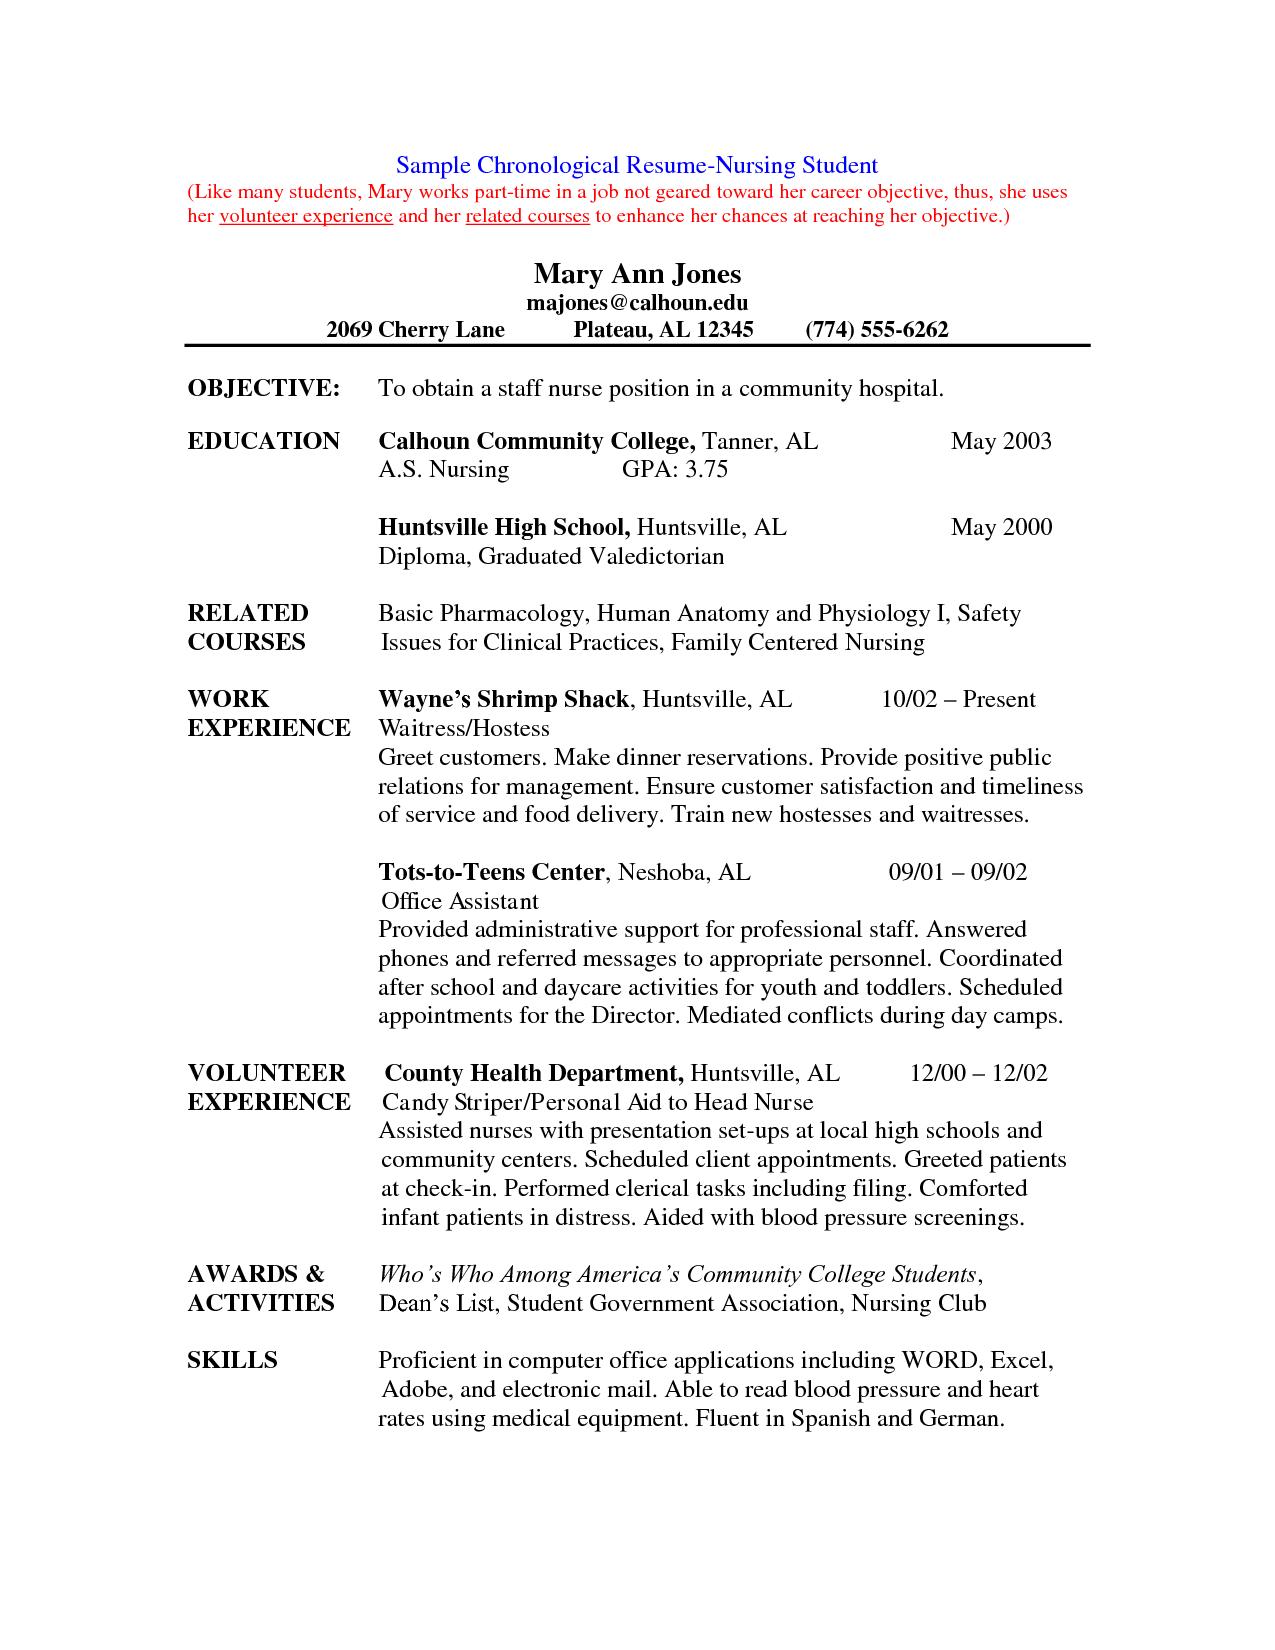 functional resume for nursing assistant